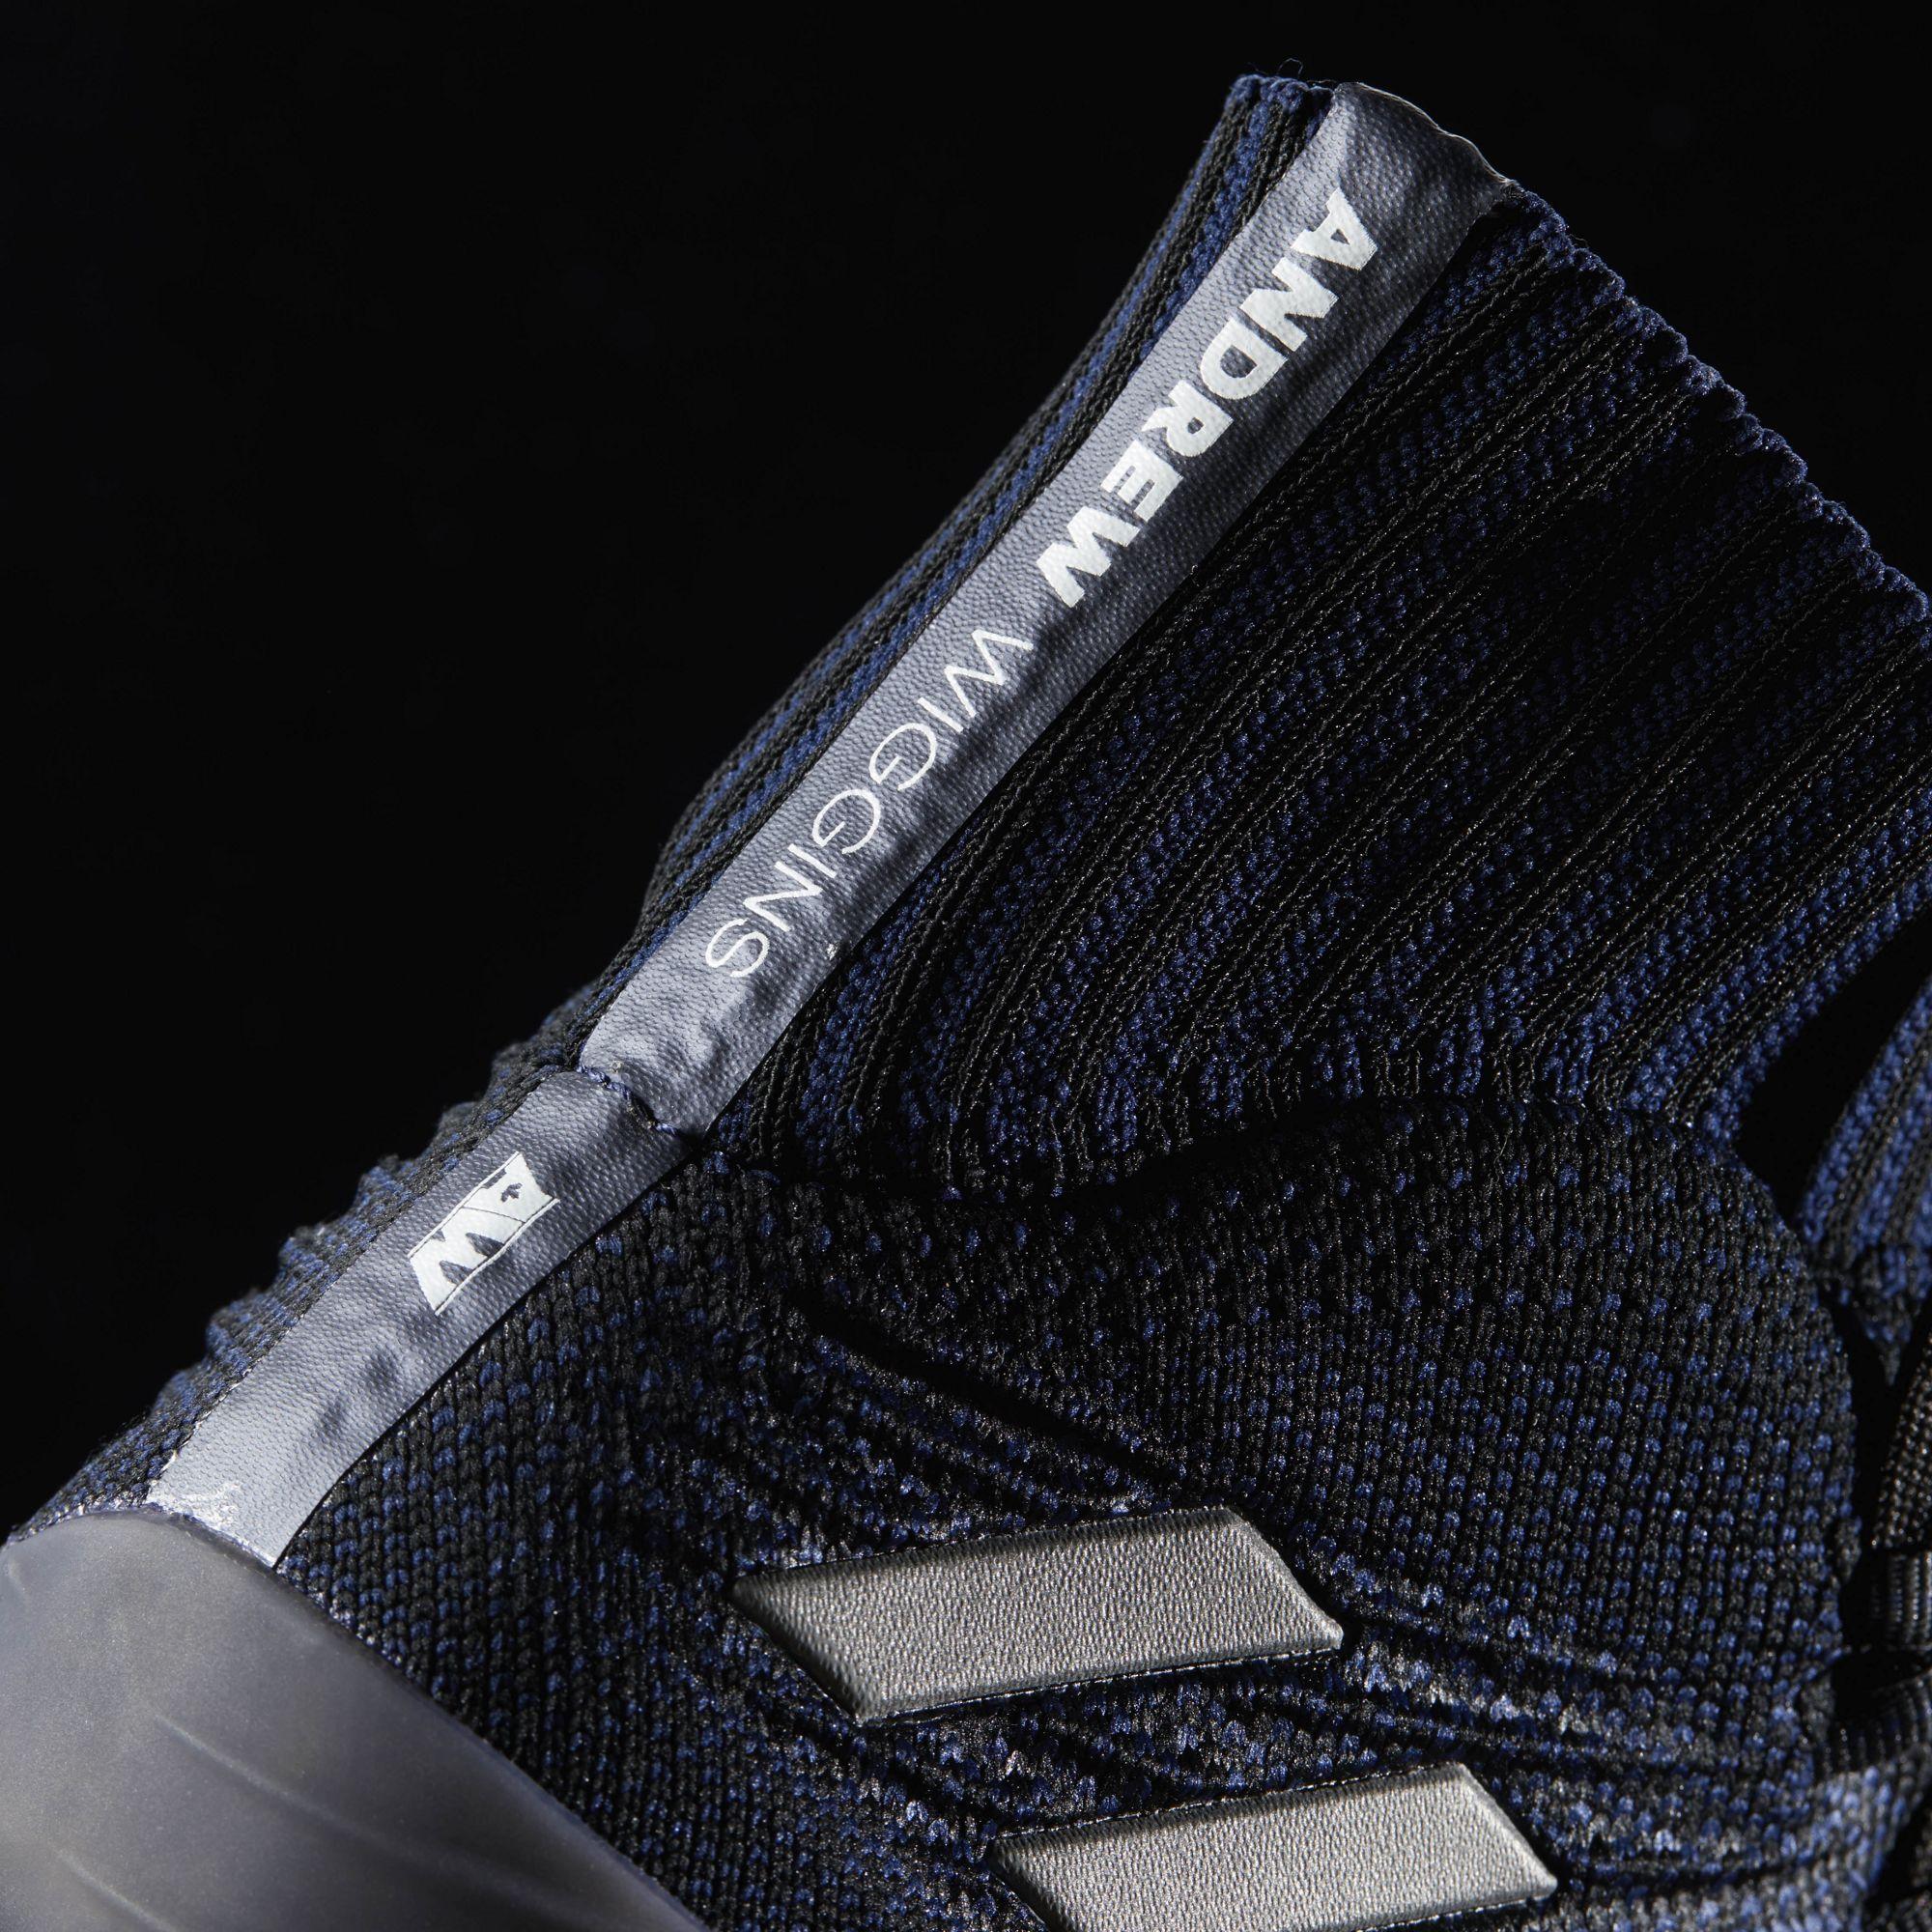 adidas crazy explosive 2017 primeknit andrew wiggins pe black 6